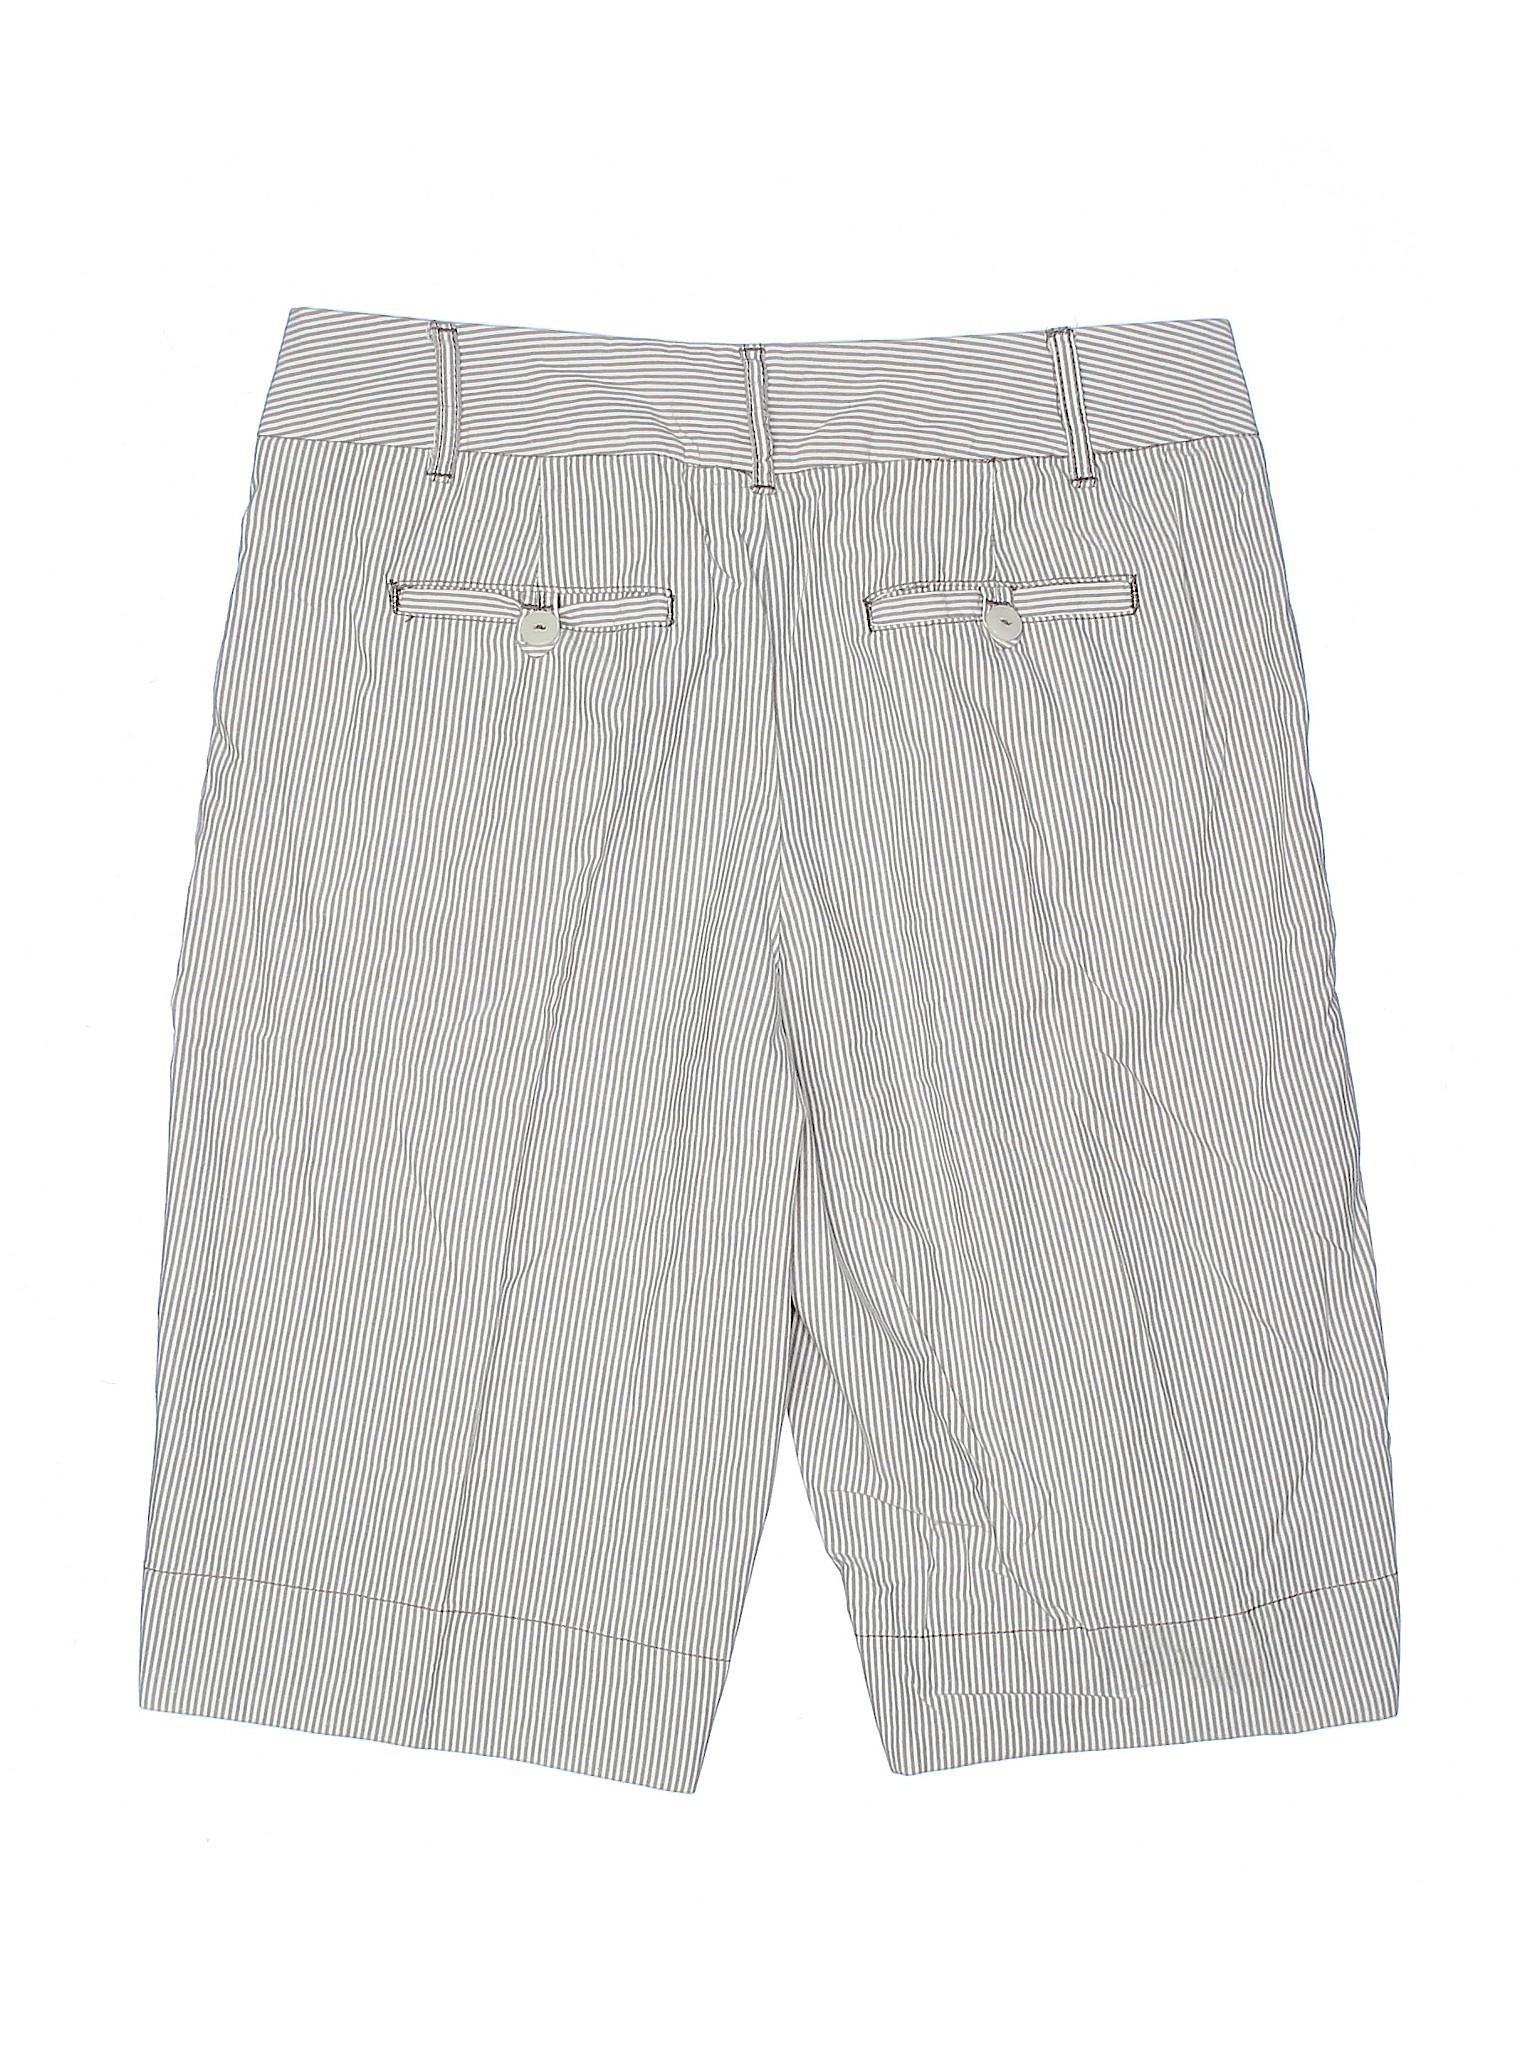 Shorts Boutique Boutique Merona Shorts Boutique Shorts Merona Merona Boutique Boutique Shorts Merona nUtSqgSBwY